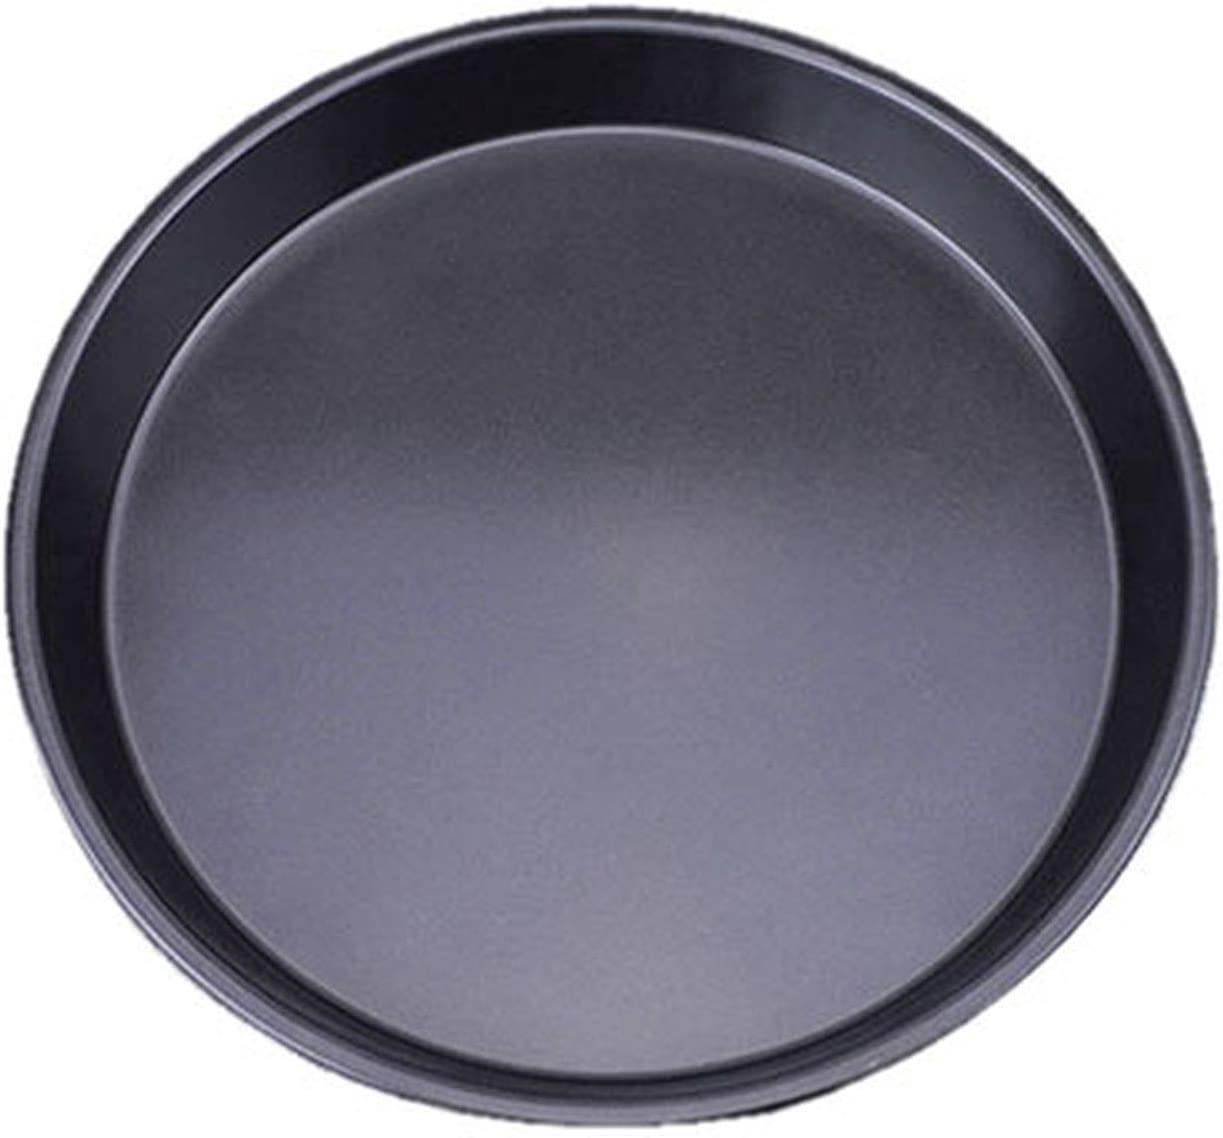 1Pcs Kitchen accessories Non Stick Carbon Steel Thicken Round Pizza Pans Baking Dish Bakeware Tray Parquet baking pan mould,Dark Khaki